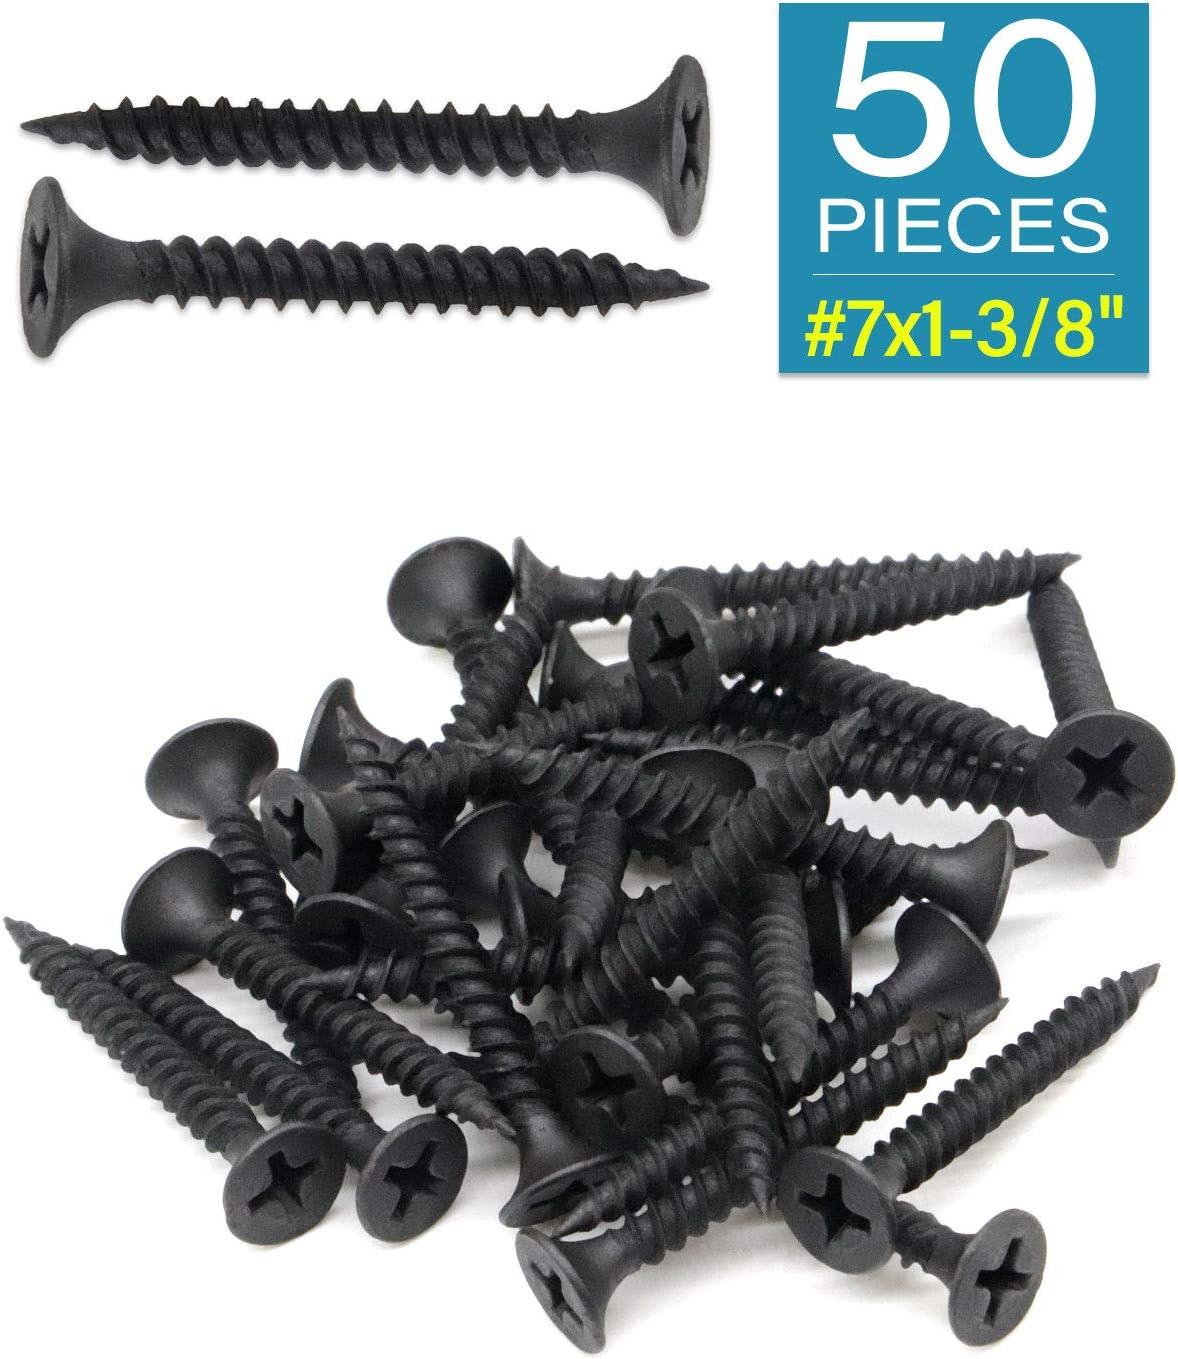 Black Phosphate IMScrews 50pcs #7x1-3//8 Flat Head Phillips Drywall Screws Fine Thread Sharp Point Wood Screw Assortment Kit Carbon Steel 1022A